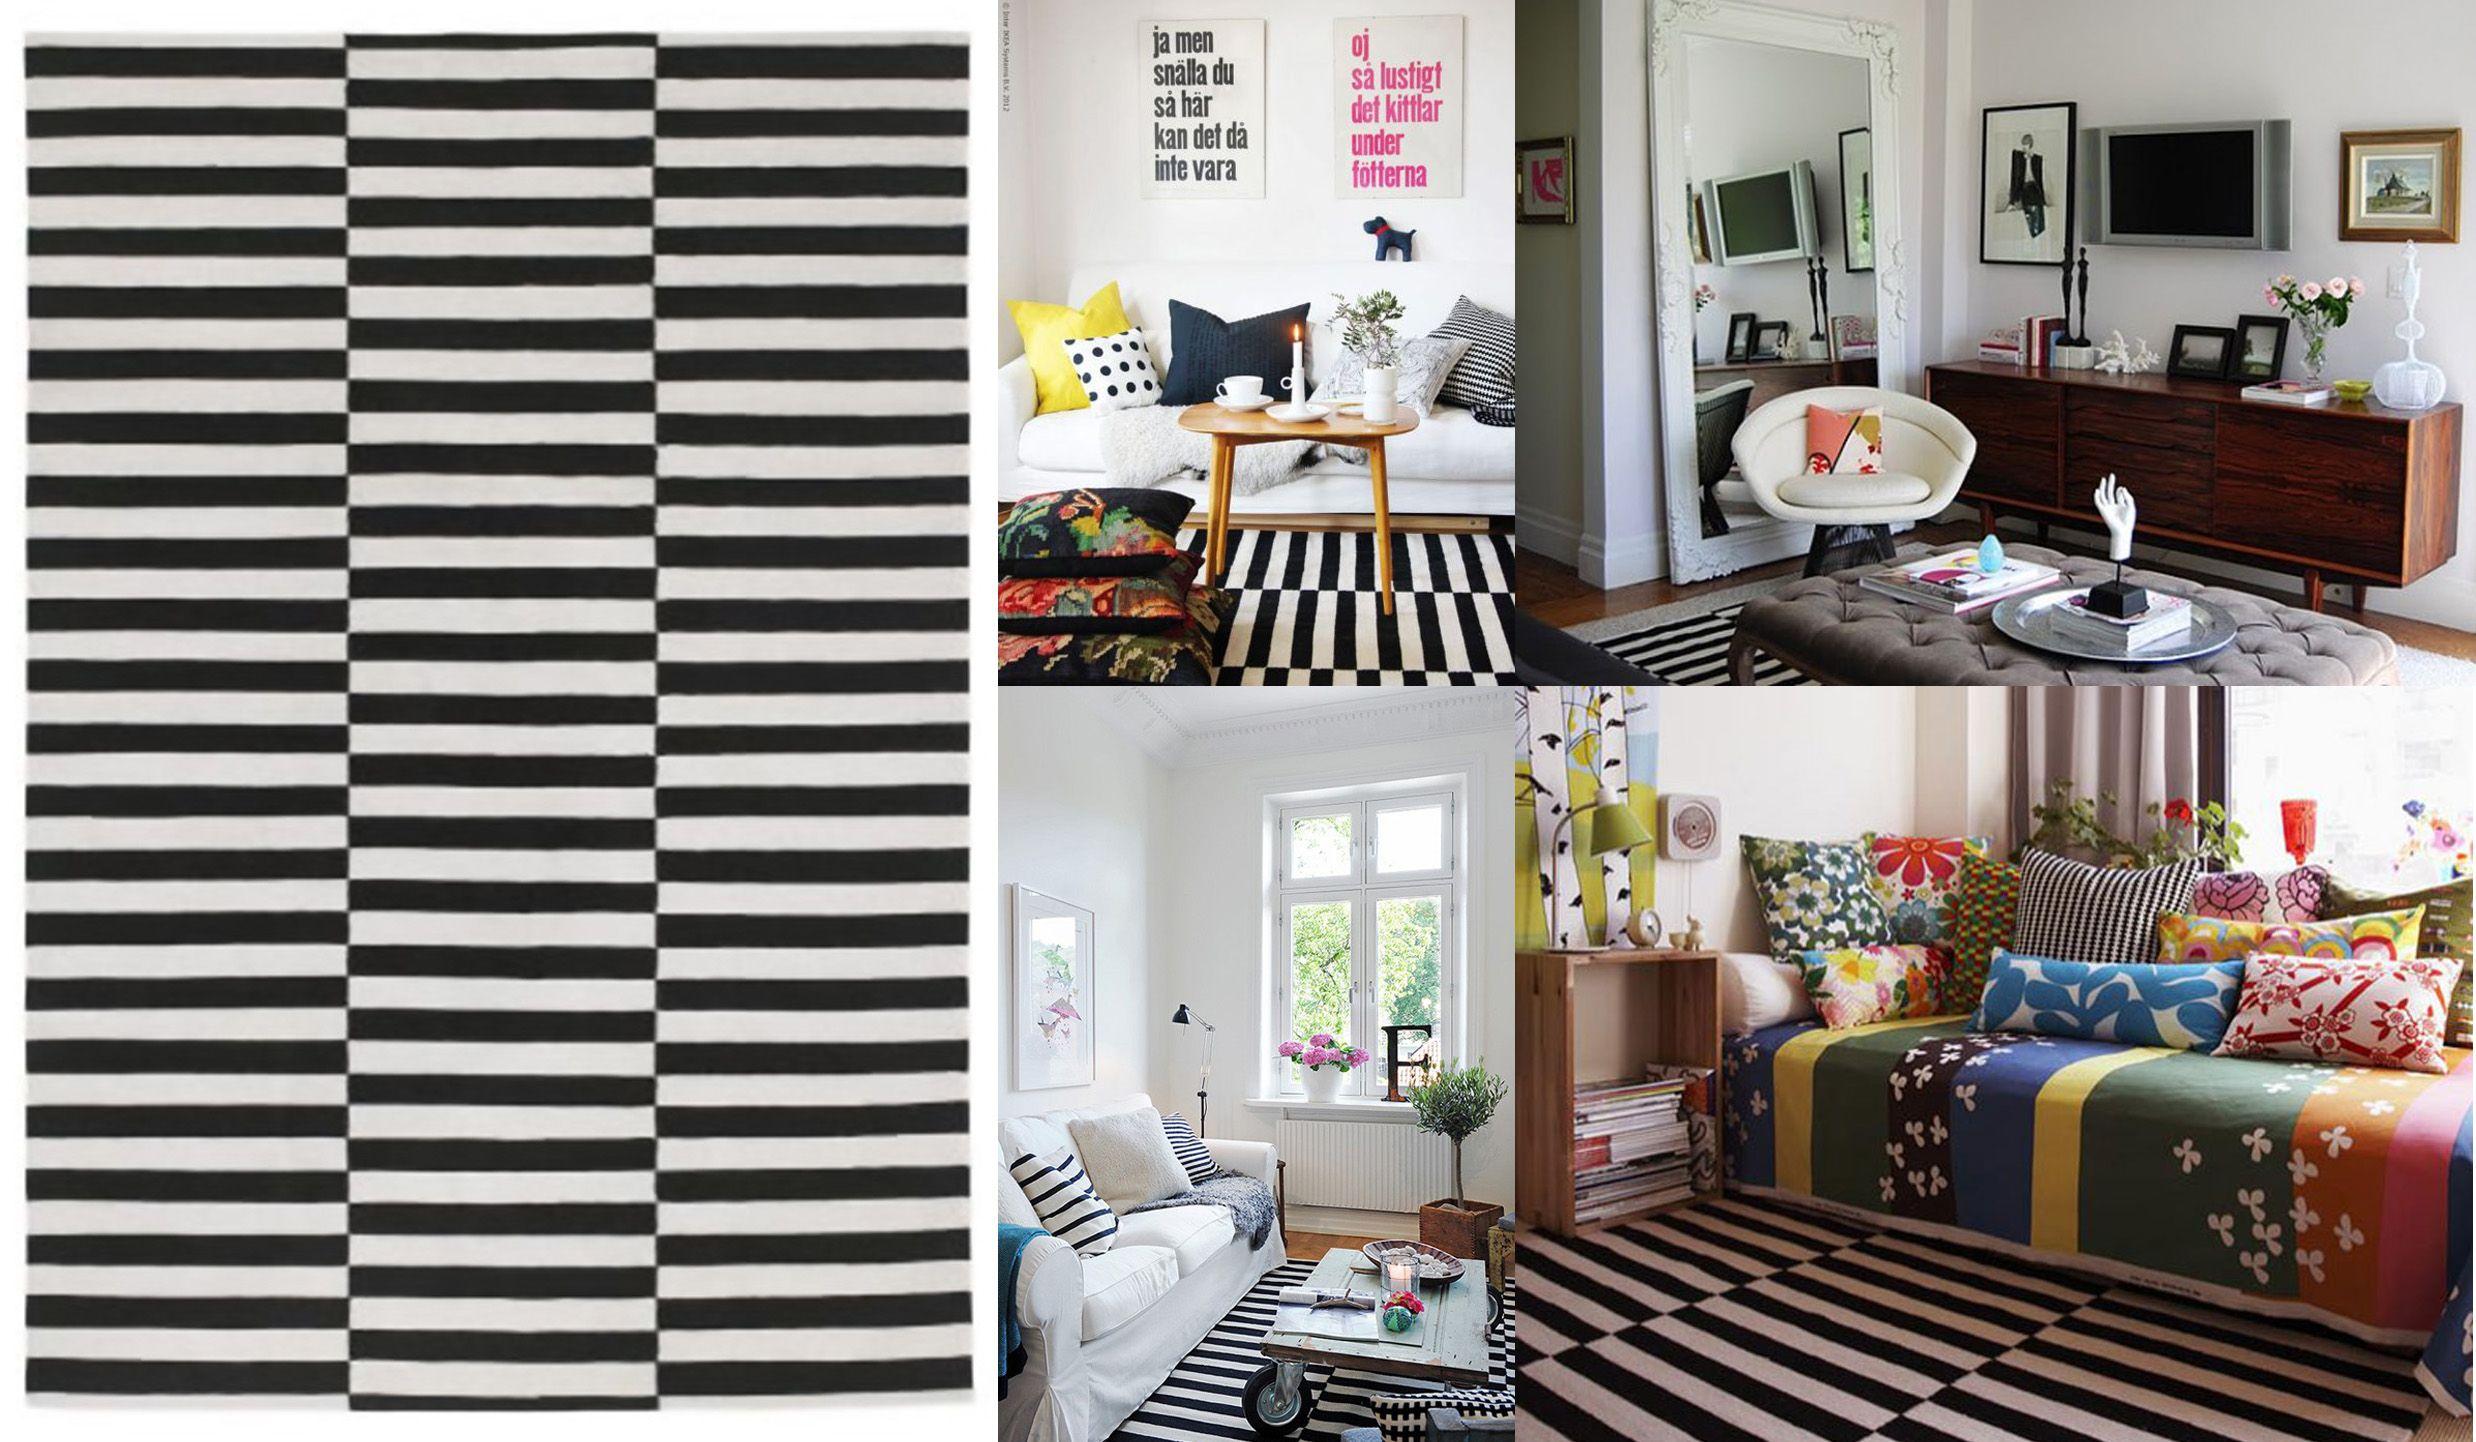 Listrado Tapete Ikea Jpg Mrandmrscalvet Home Decor Pinterest  -> Tapete Sala Listrado Preto E Branco